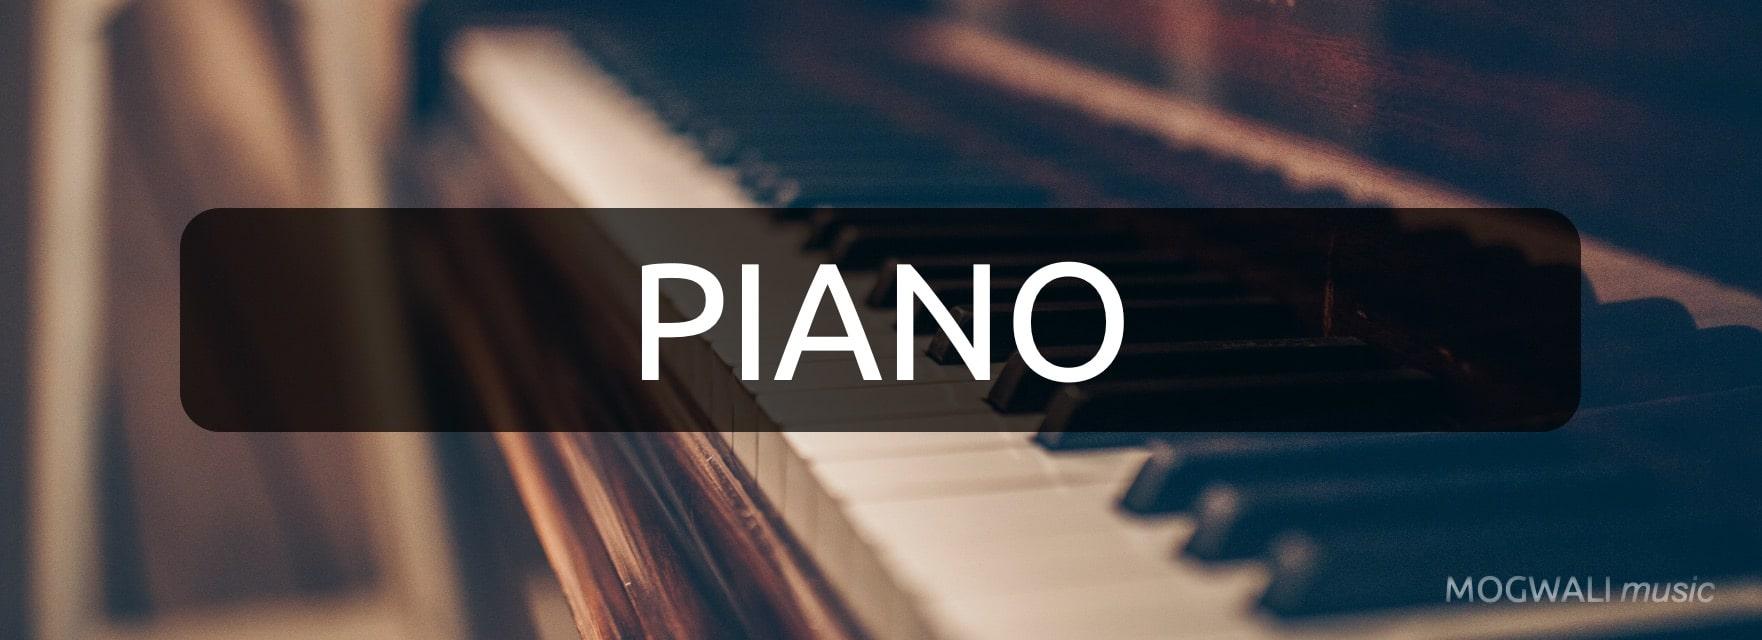 Piano-min